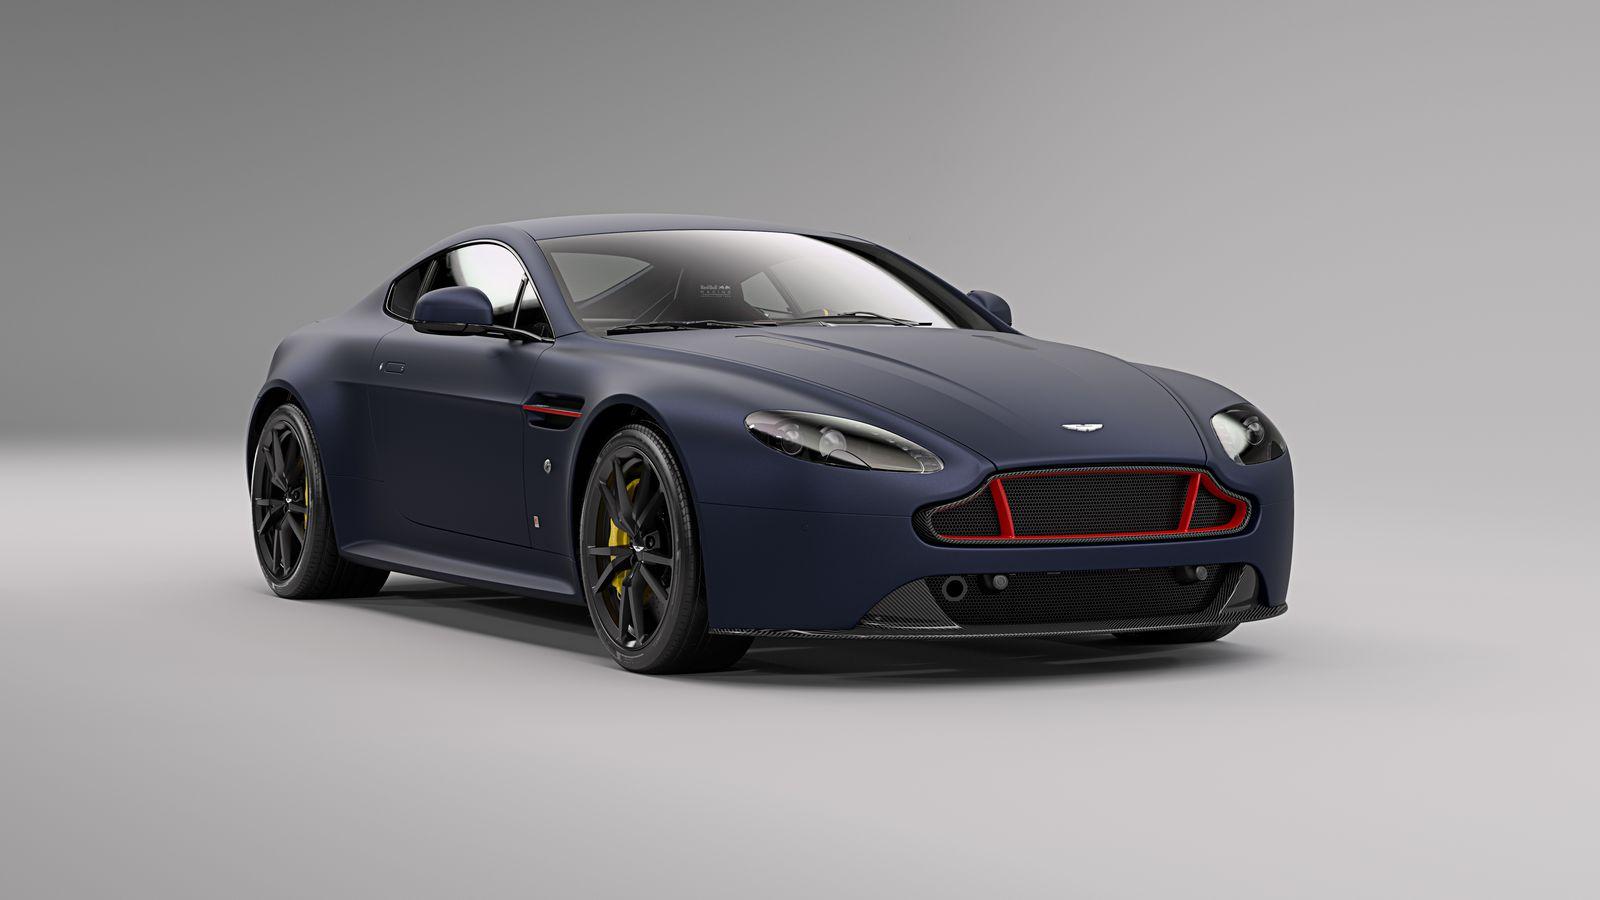 Aston Martin V8 and V12 Vantage Red Bull Racing Editions (2)